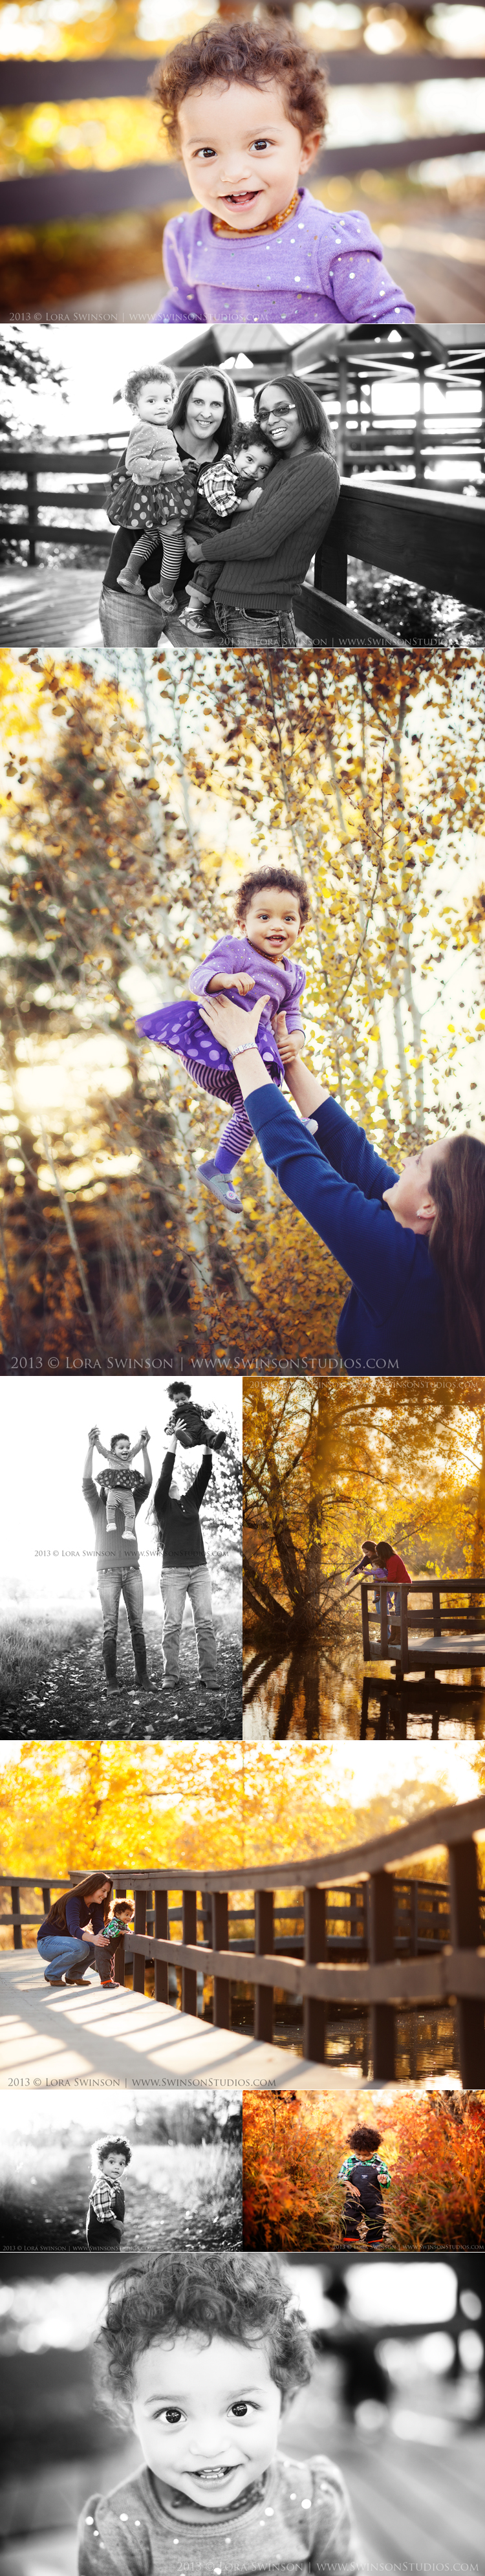 Denver-CO-Family-Photographer-12